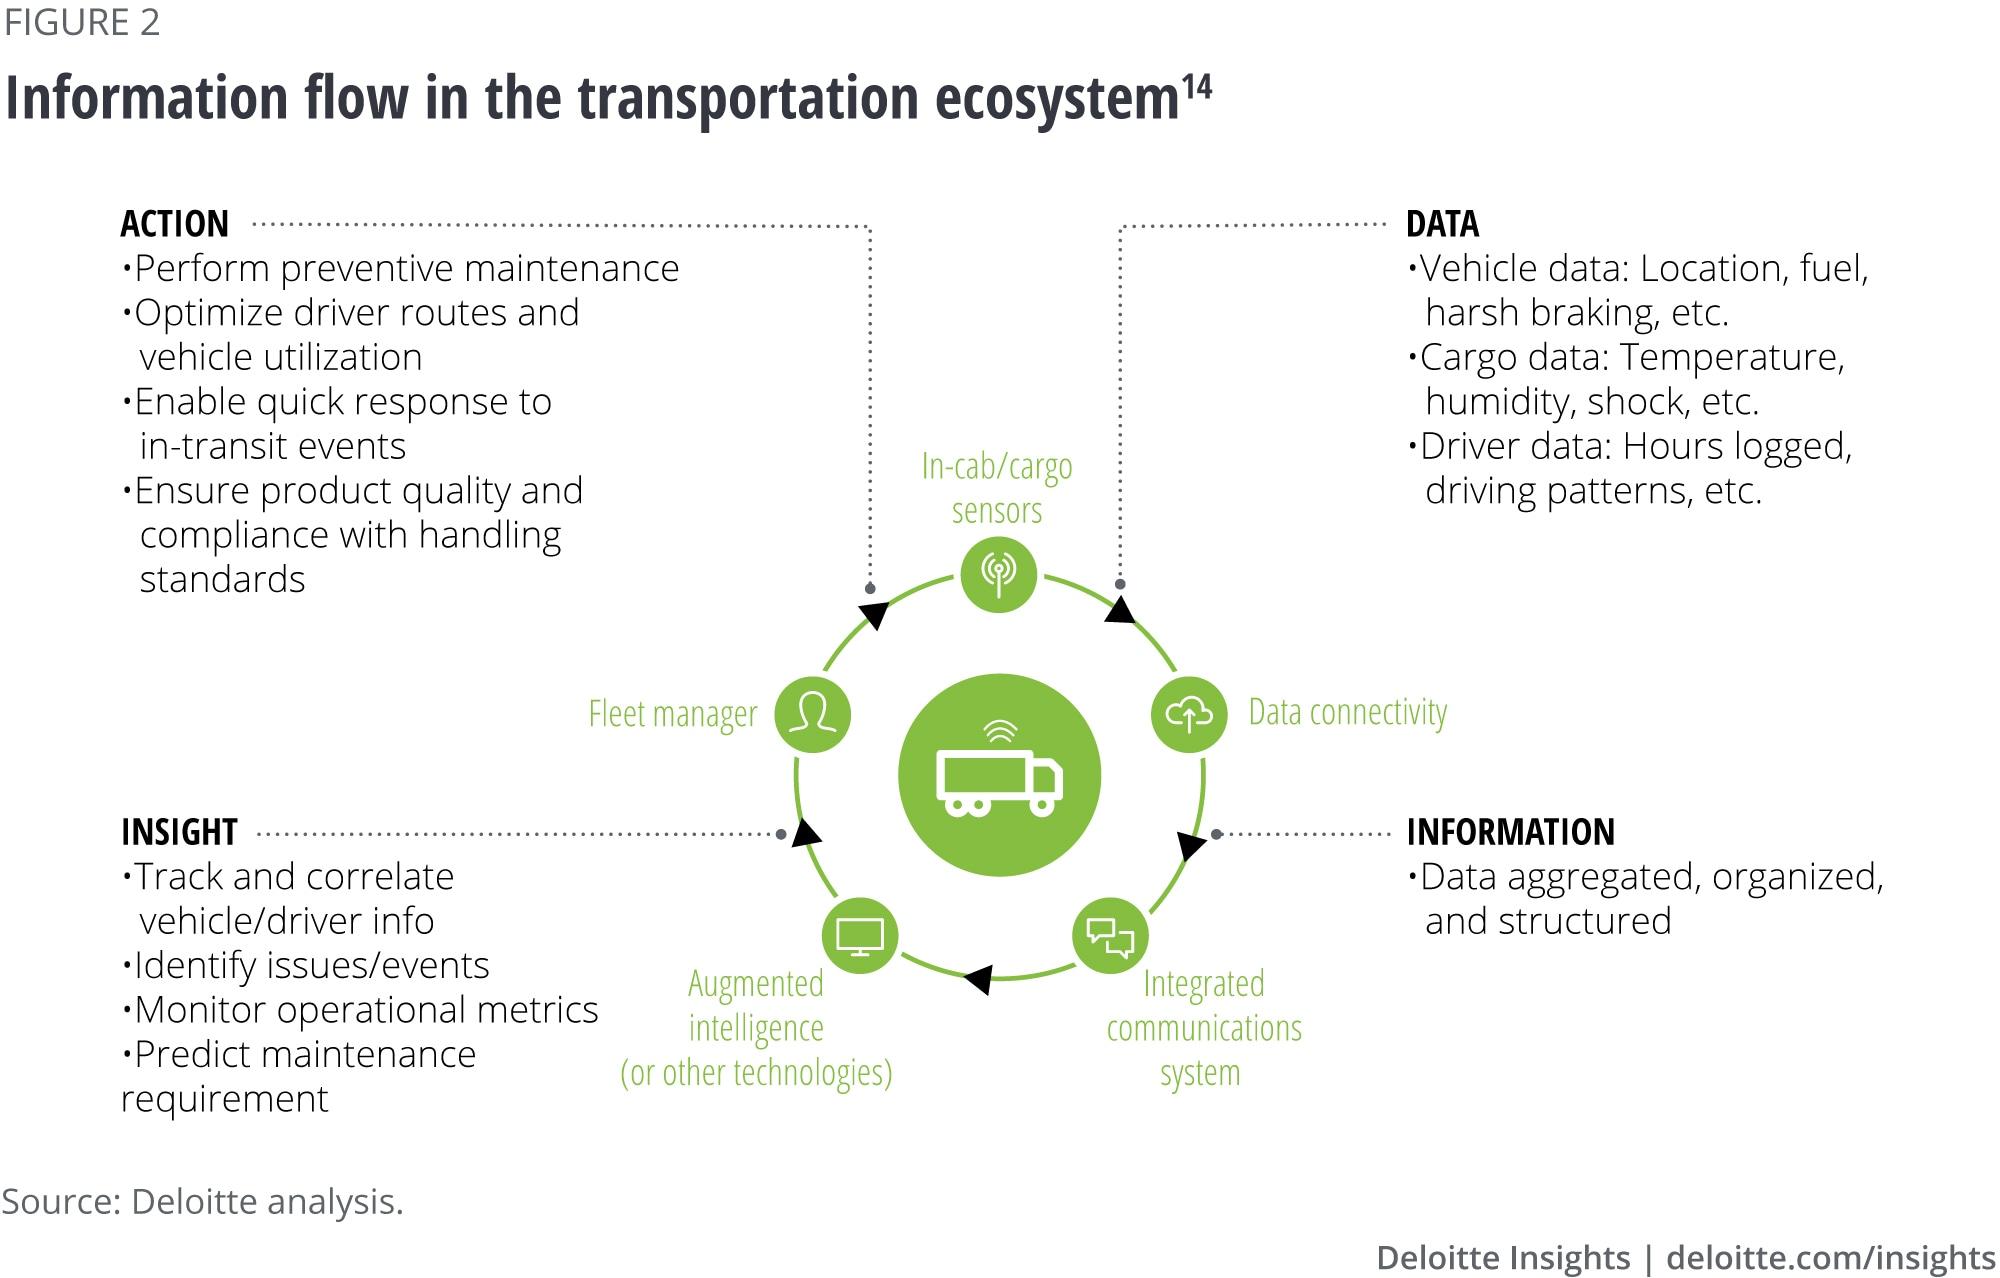 Information flow in the transportation ecosystem